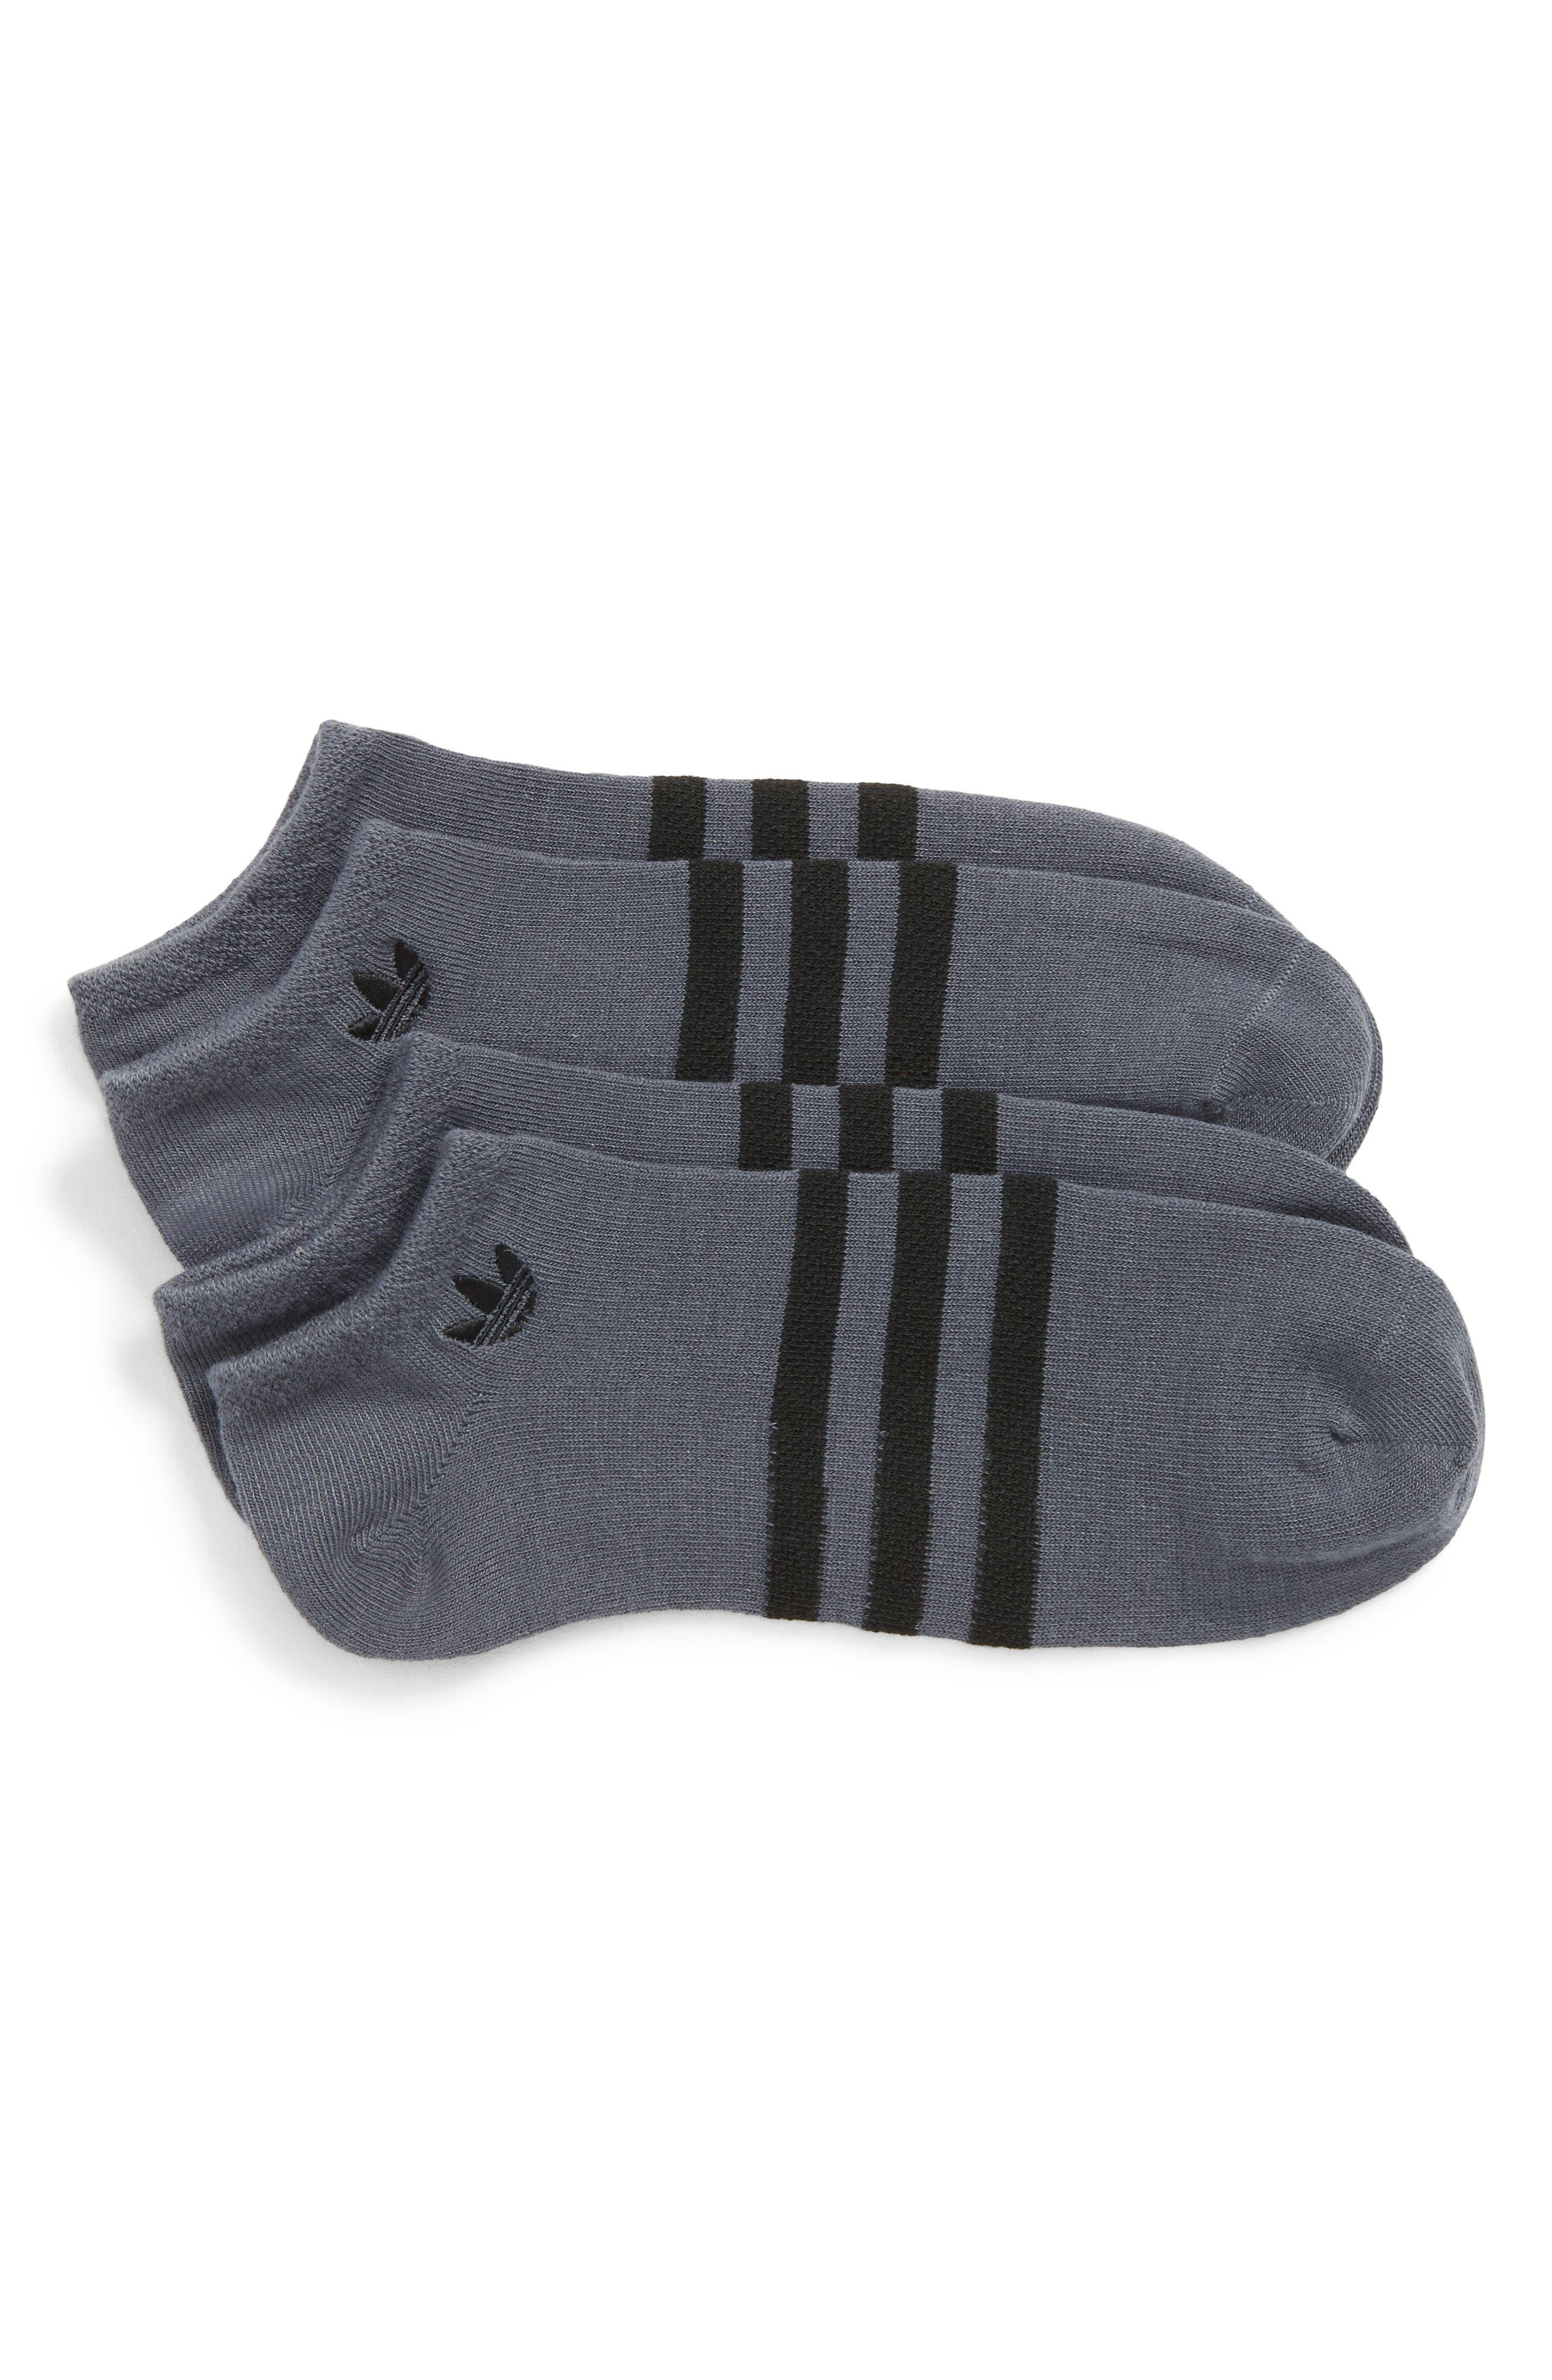 2-Pack No-Show Socks,                         Main,                         color, Onyx/ Black